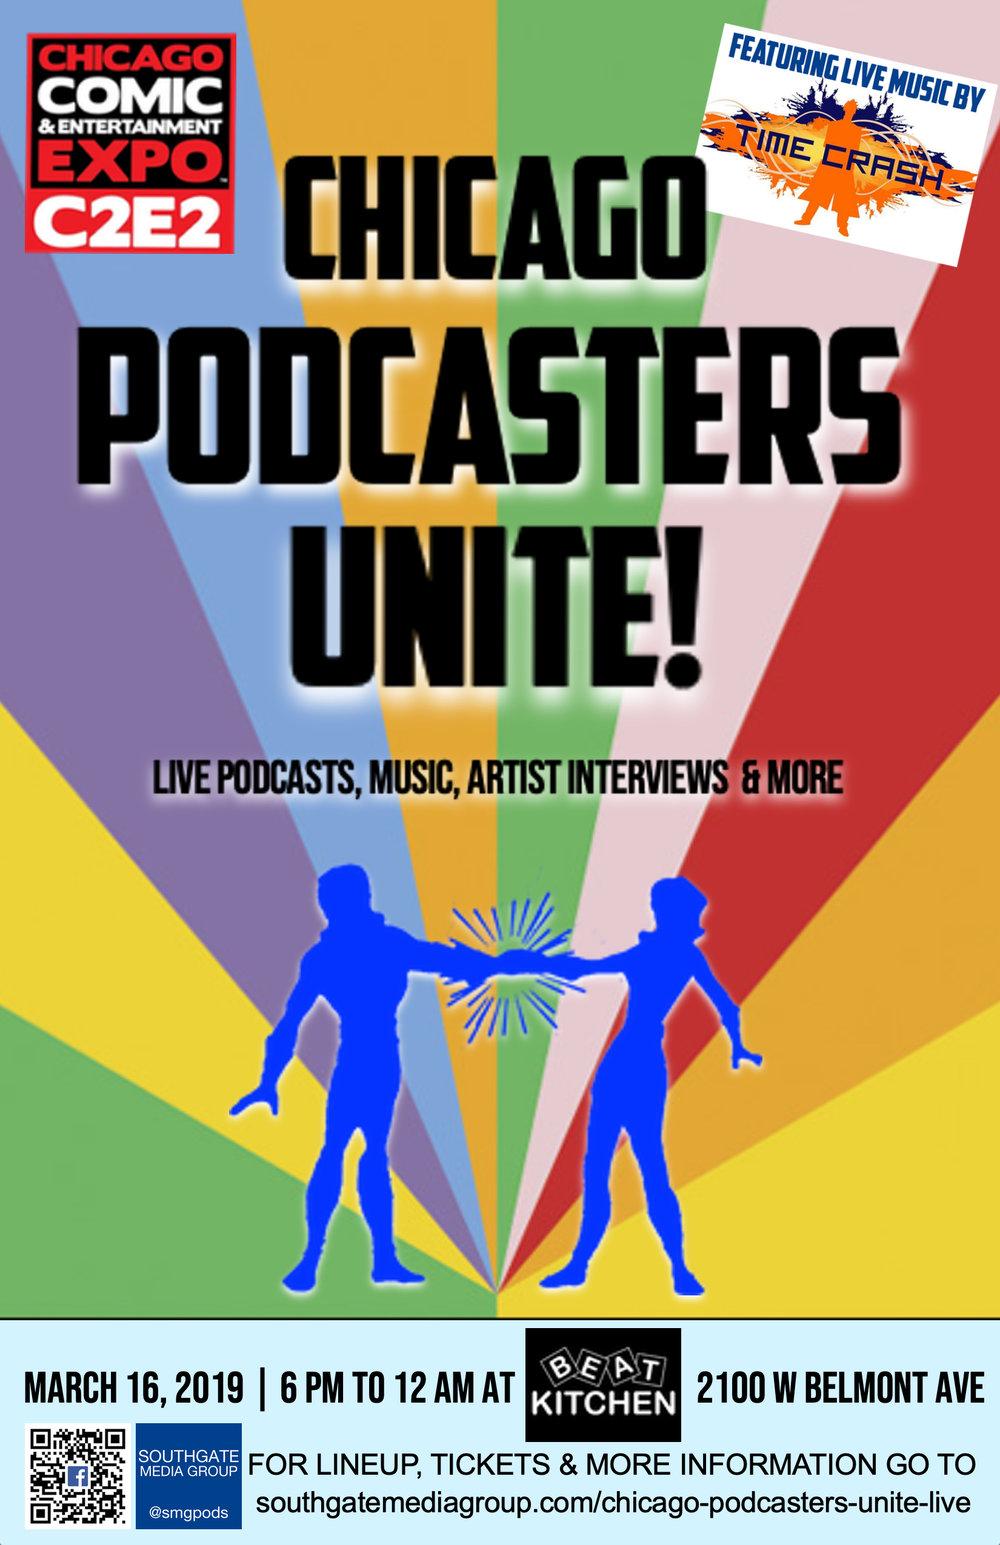 c2e2 Blue Chicago Podcasters Unite 11X17 POSTER C.jpg